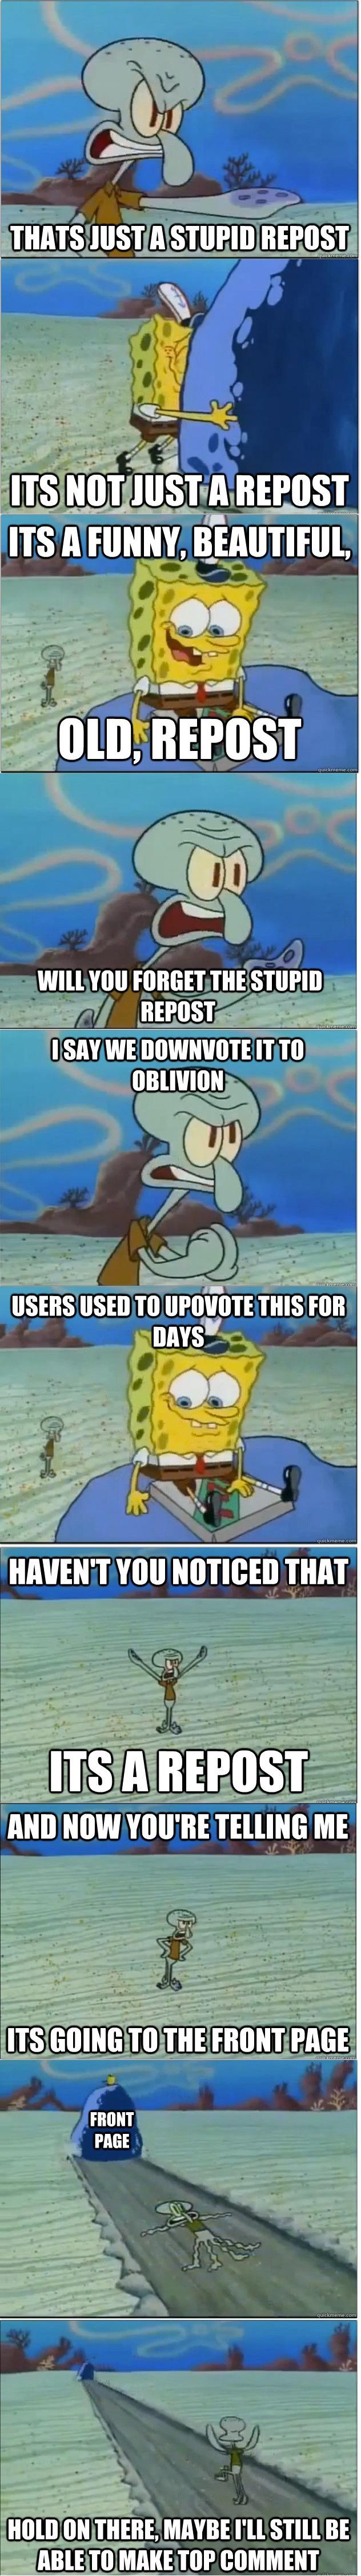 Reposts. Reposts.. ''Upvotes'' repost